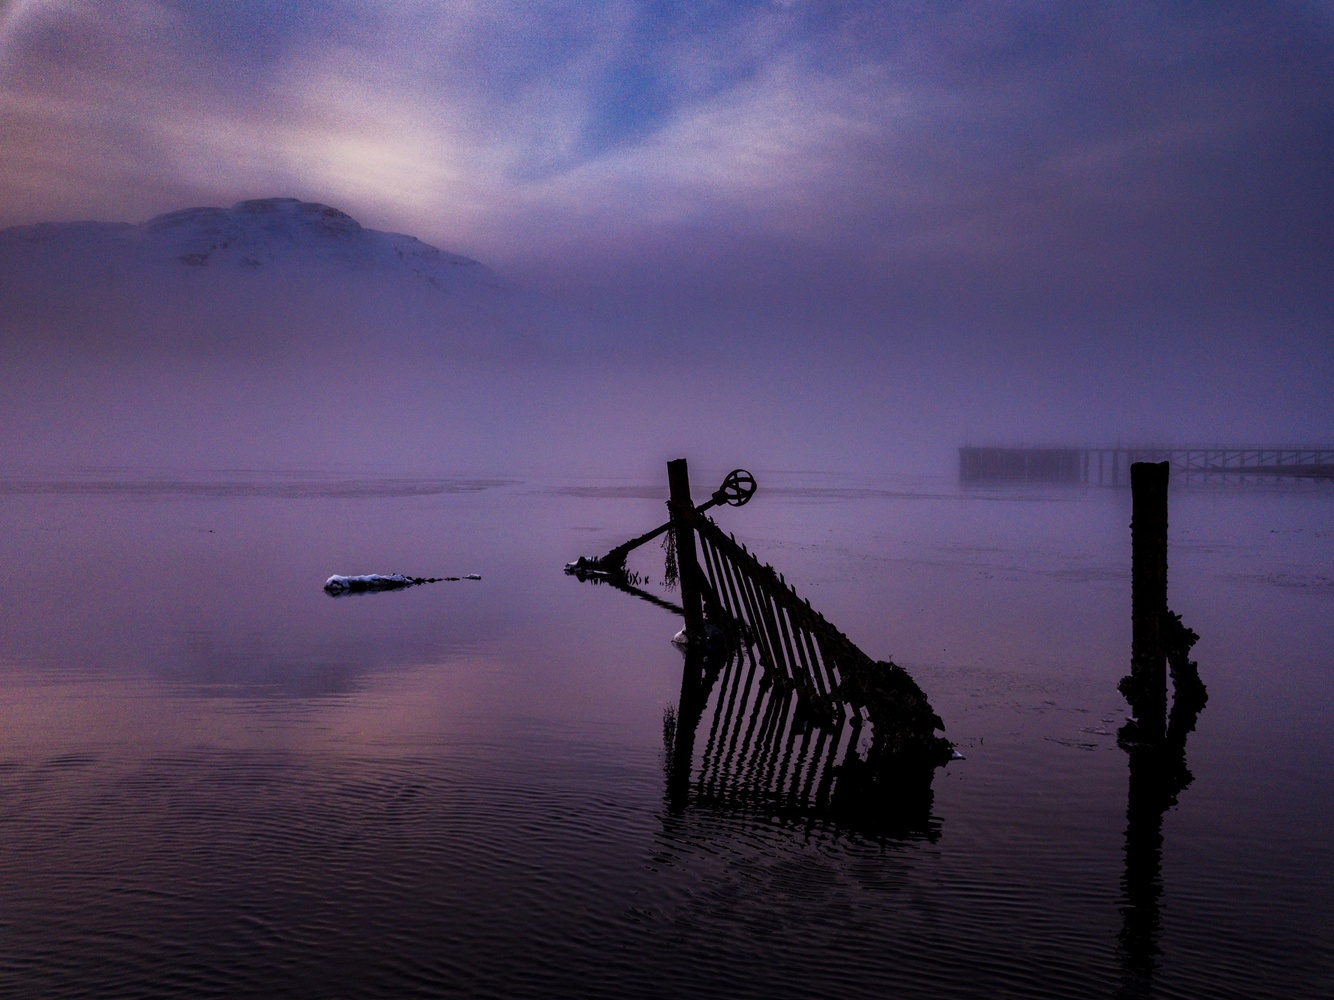 Into the mist by Martin Carrera